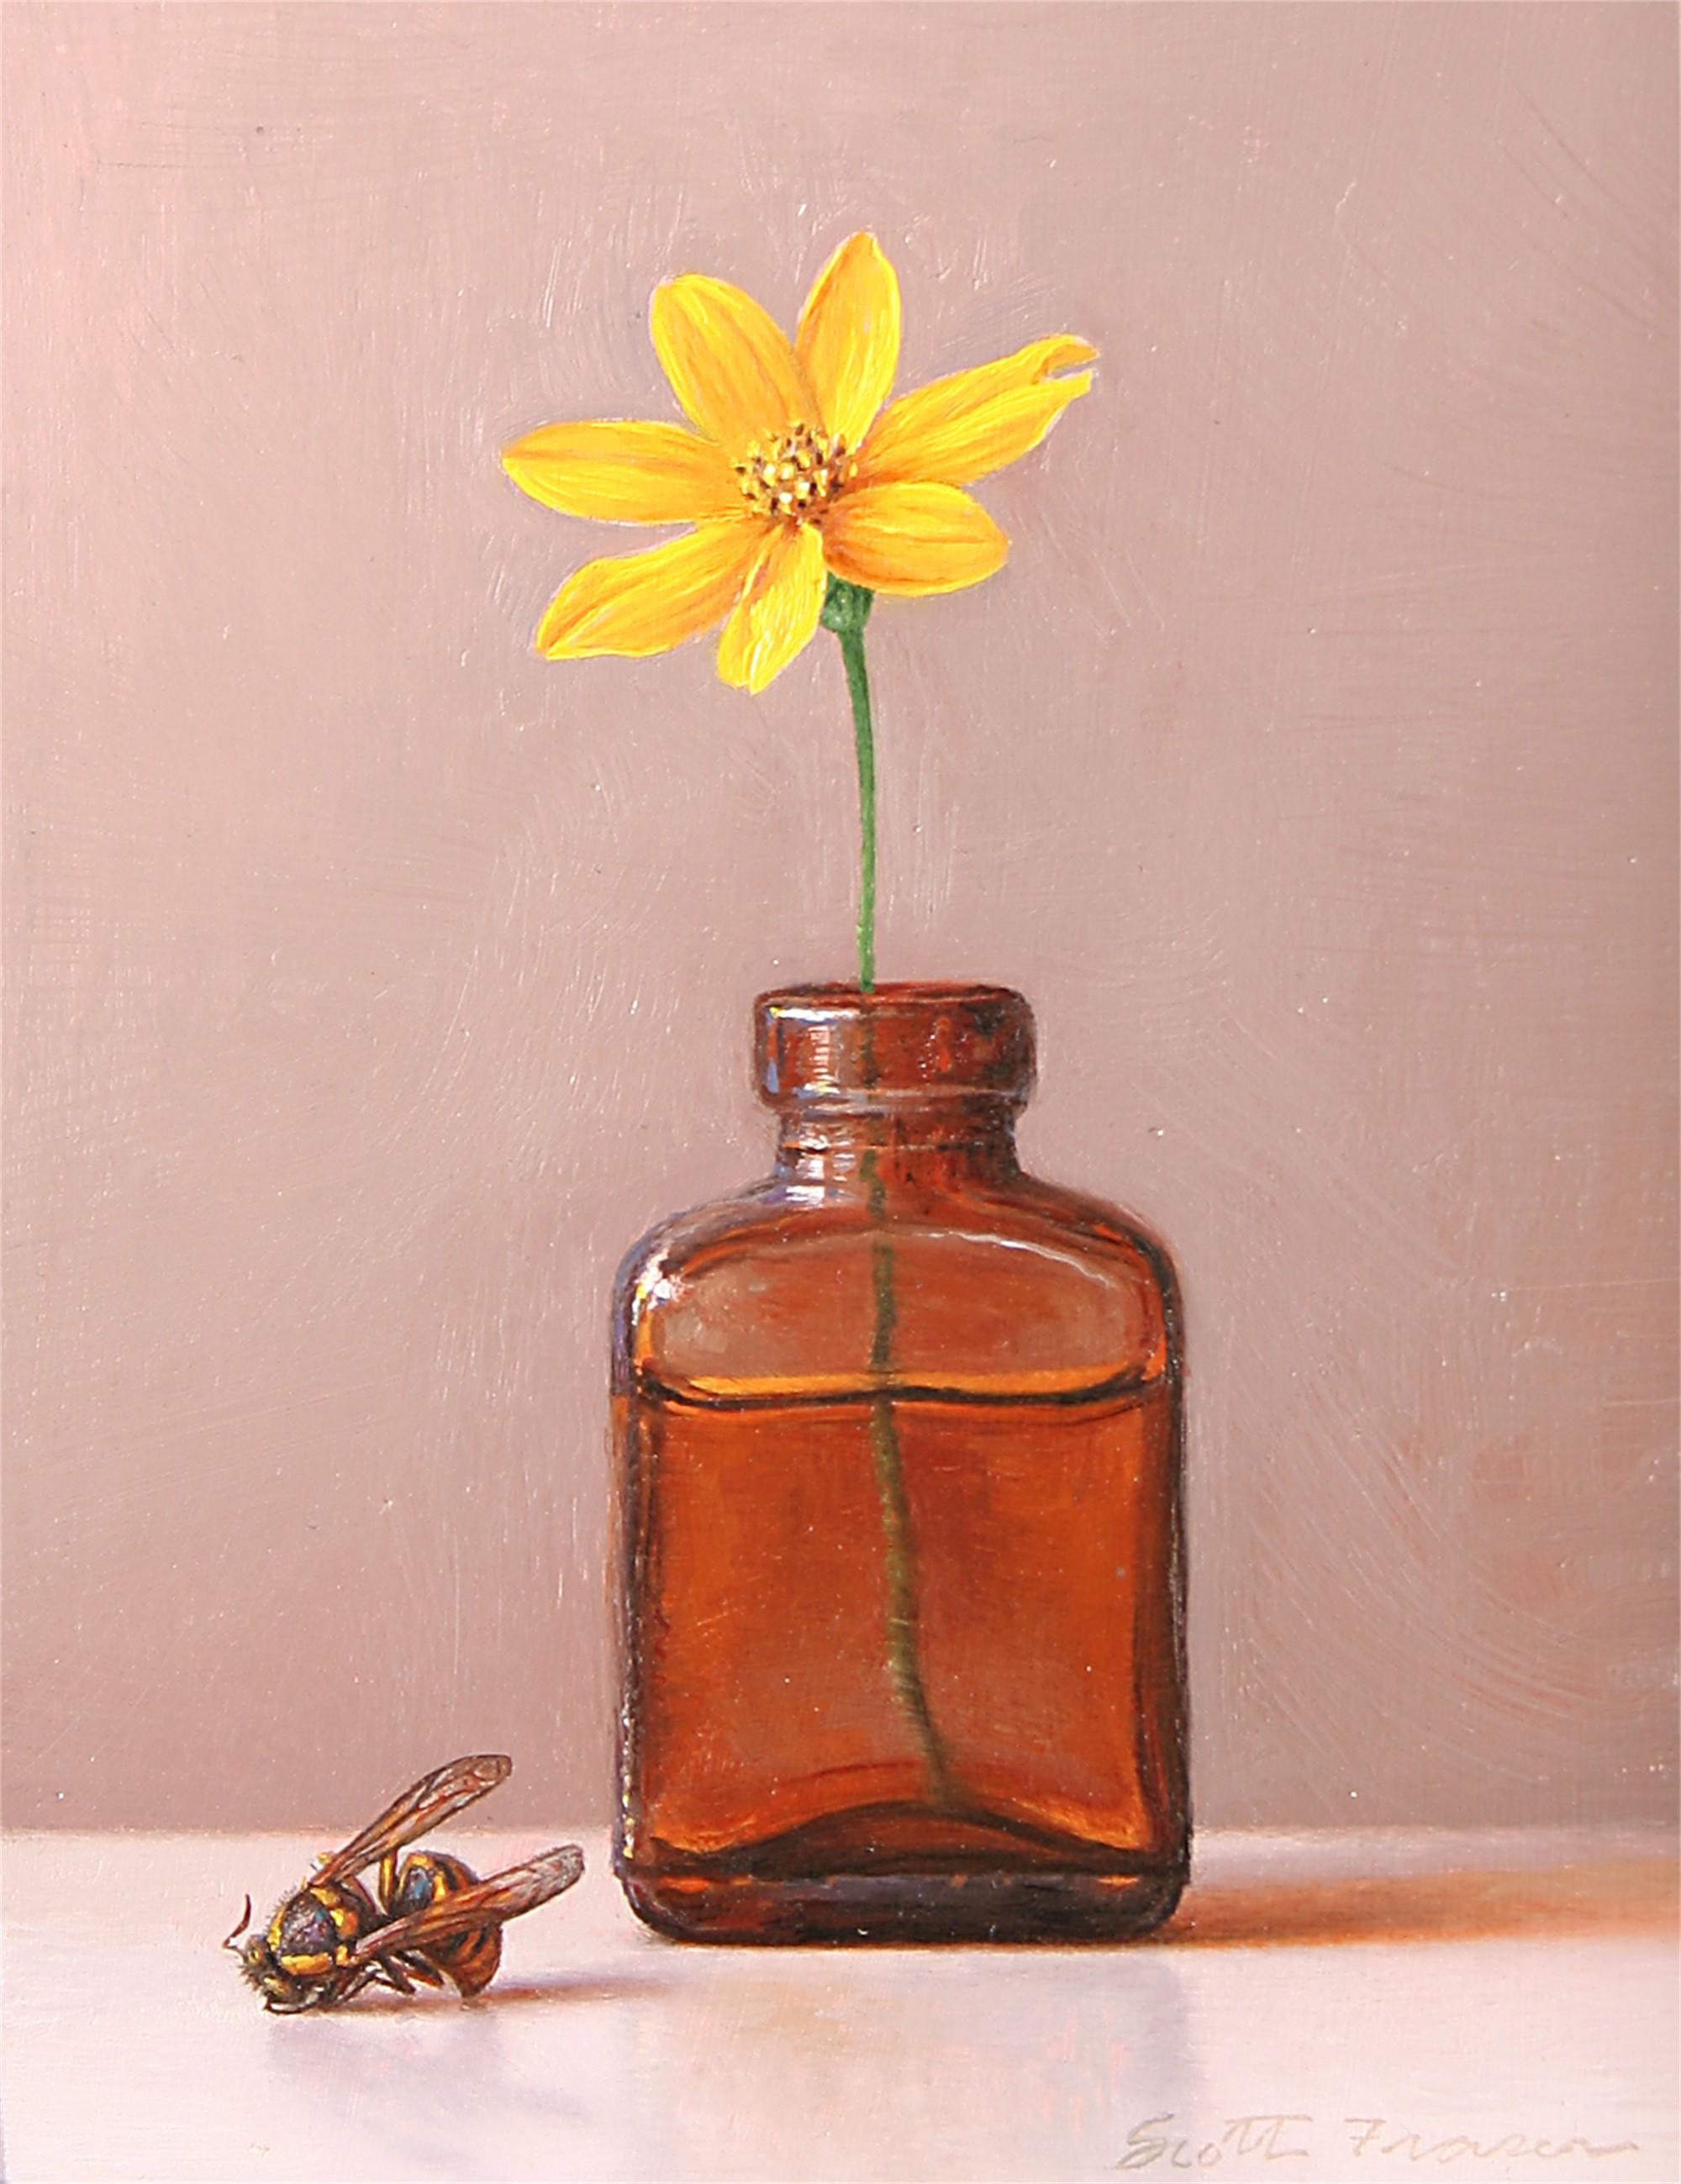 Flower Bottle Wasp by Scott Fraser